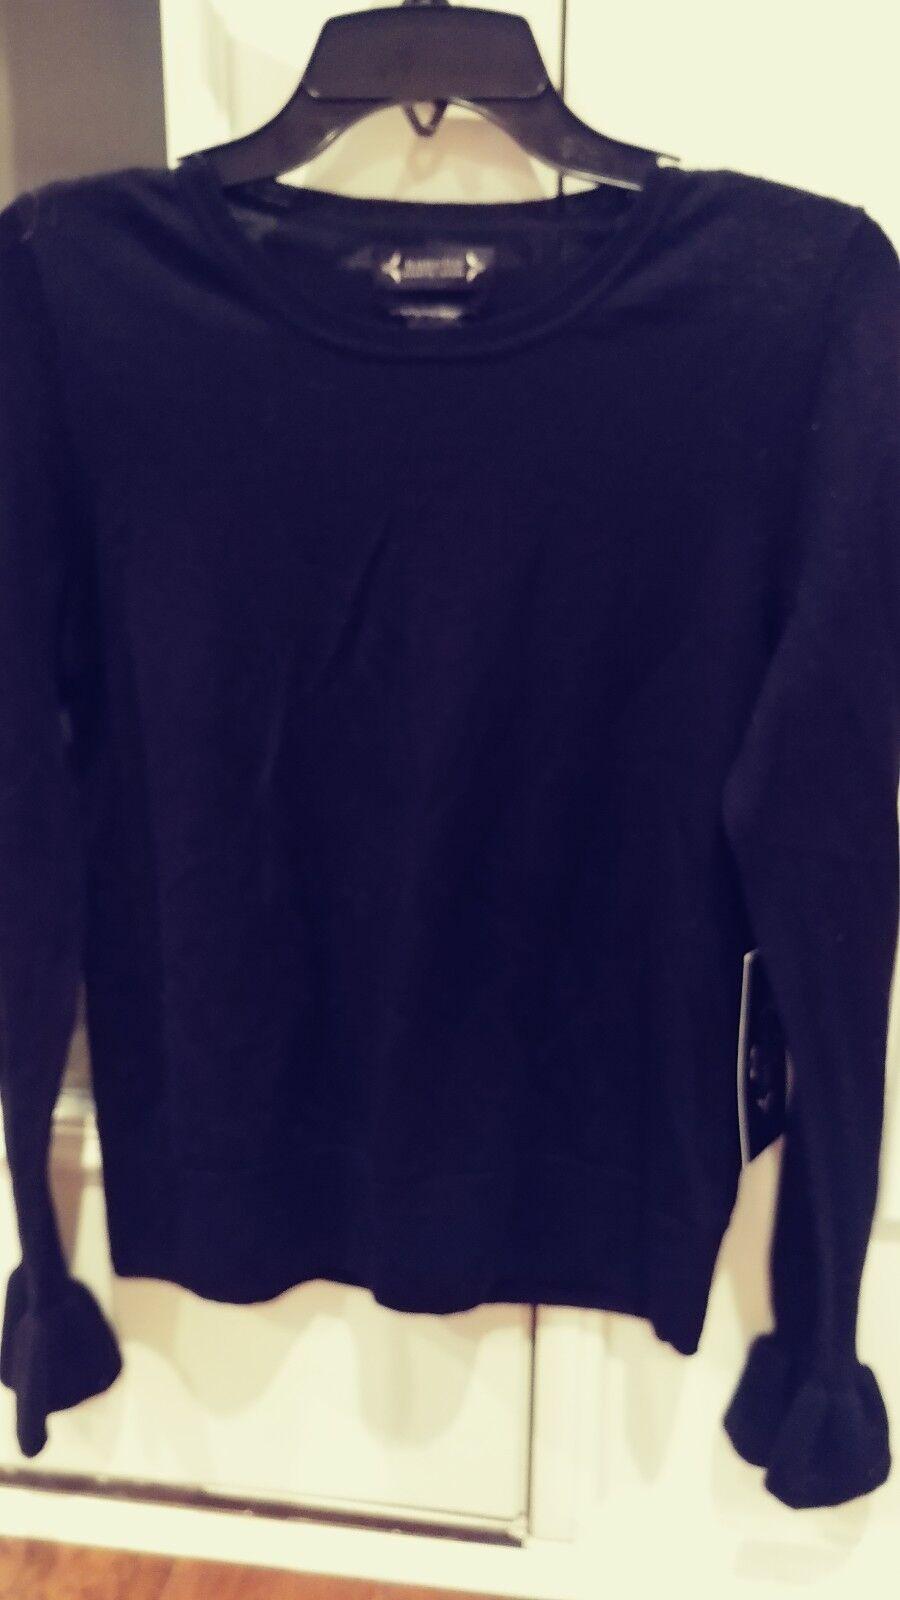 Nanette Lepore NWT Women's 100% Extra Fine Merino Wool Bell Cuff Sweater Size M